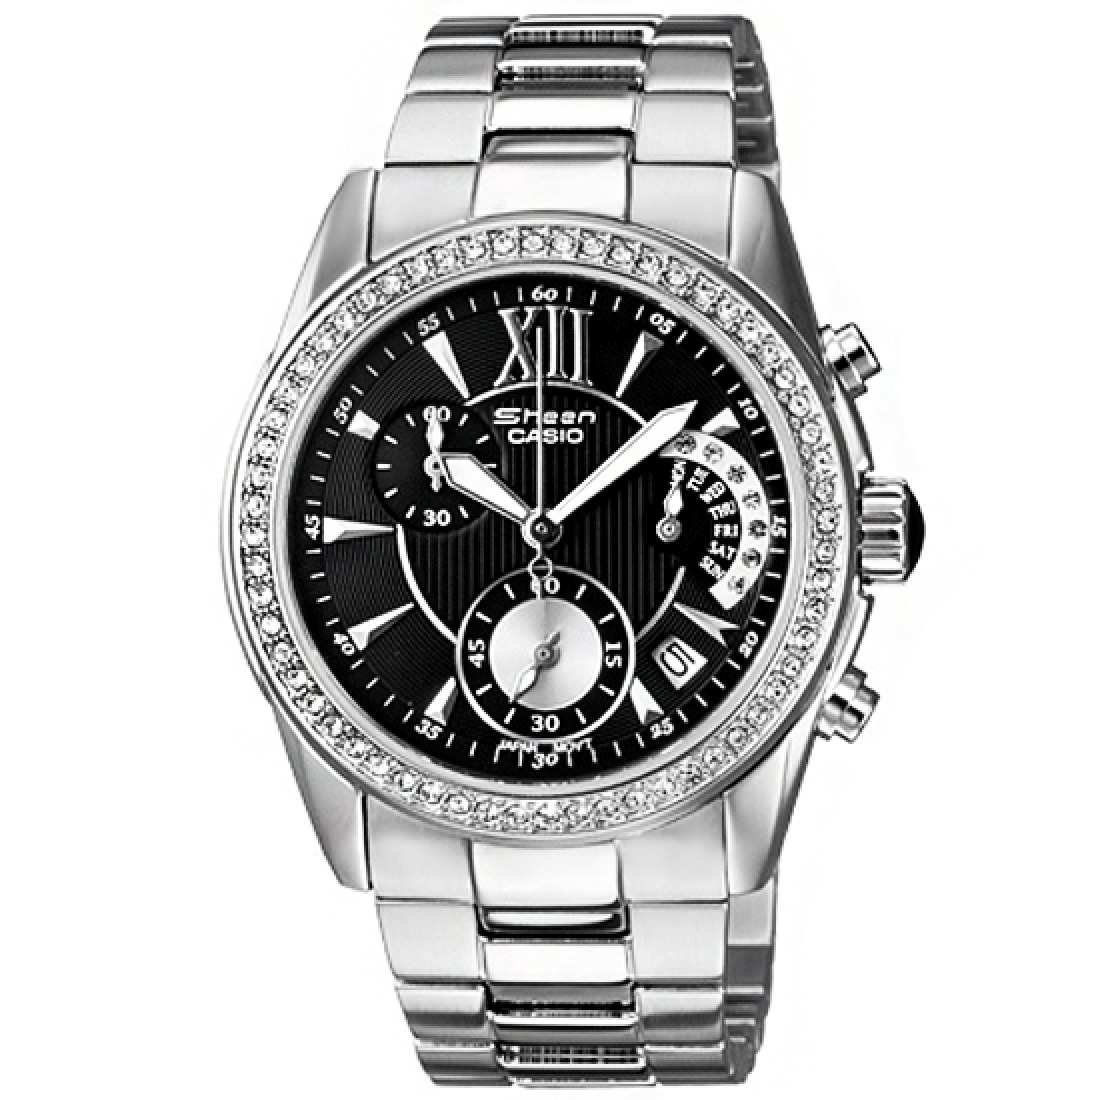 28fbf358e41f reloj casio edifice mujer shn-5505d-1a envío internacional. Cargando zoom.